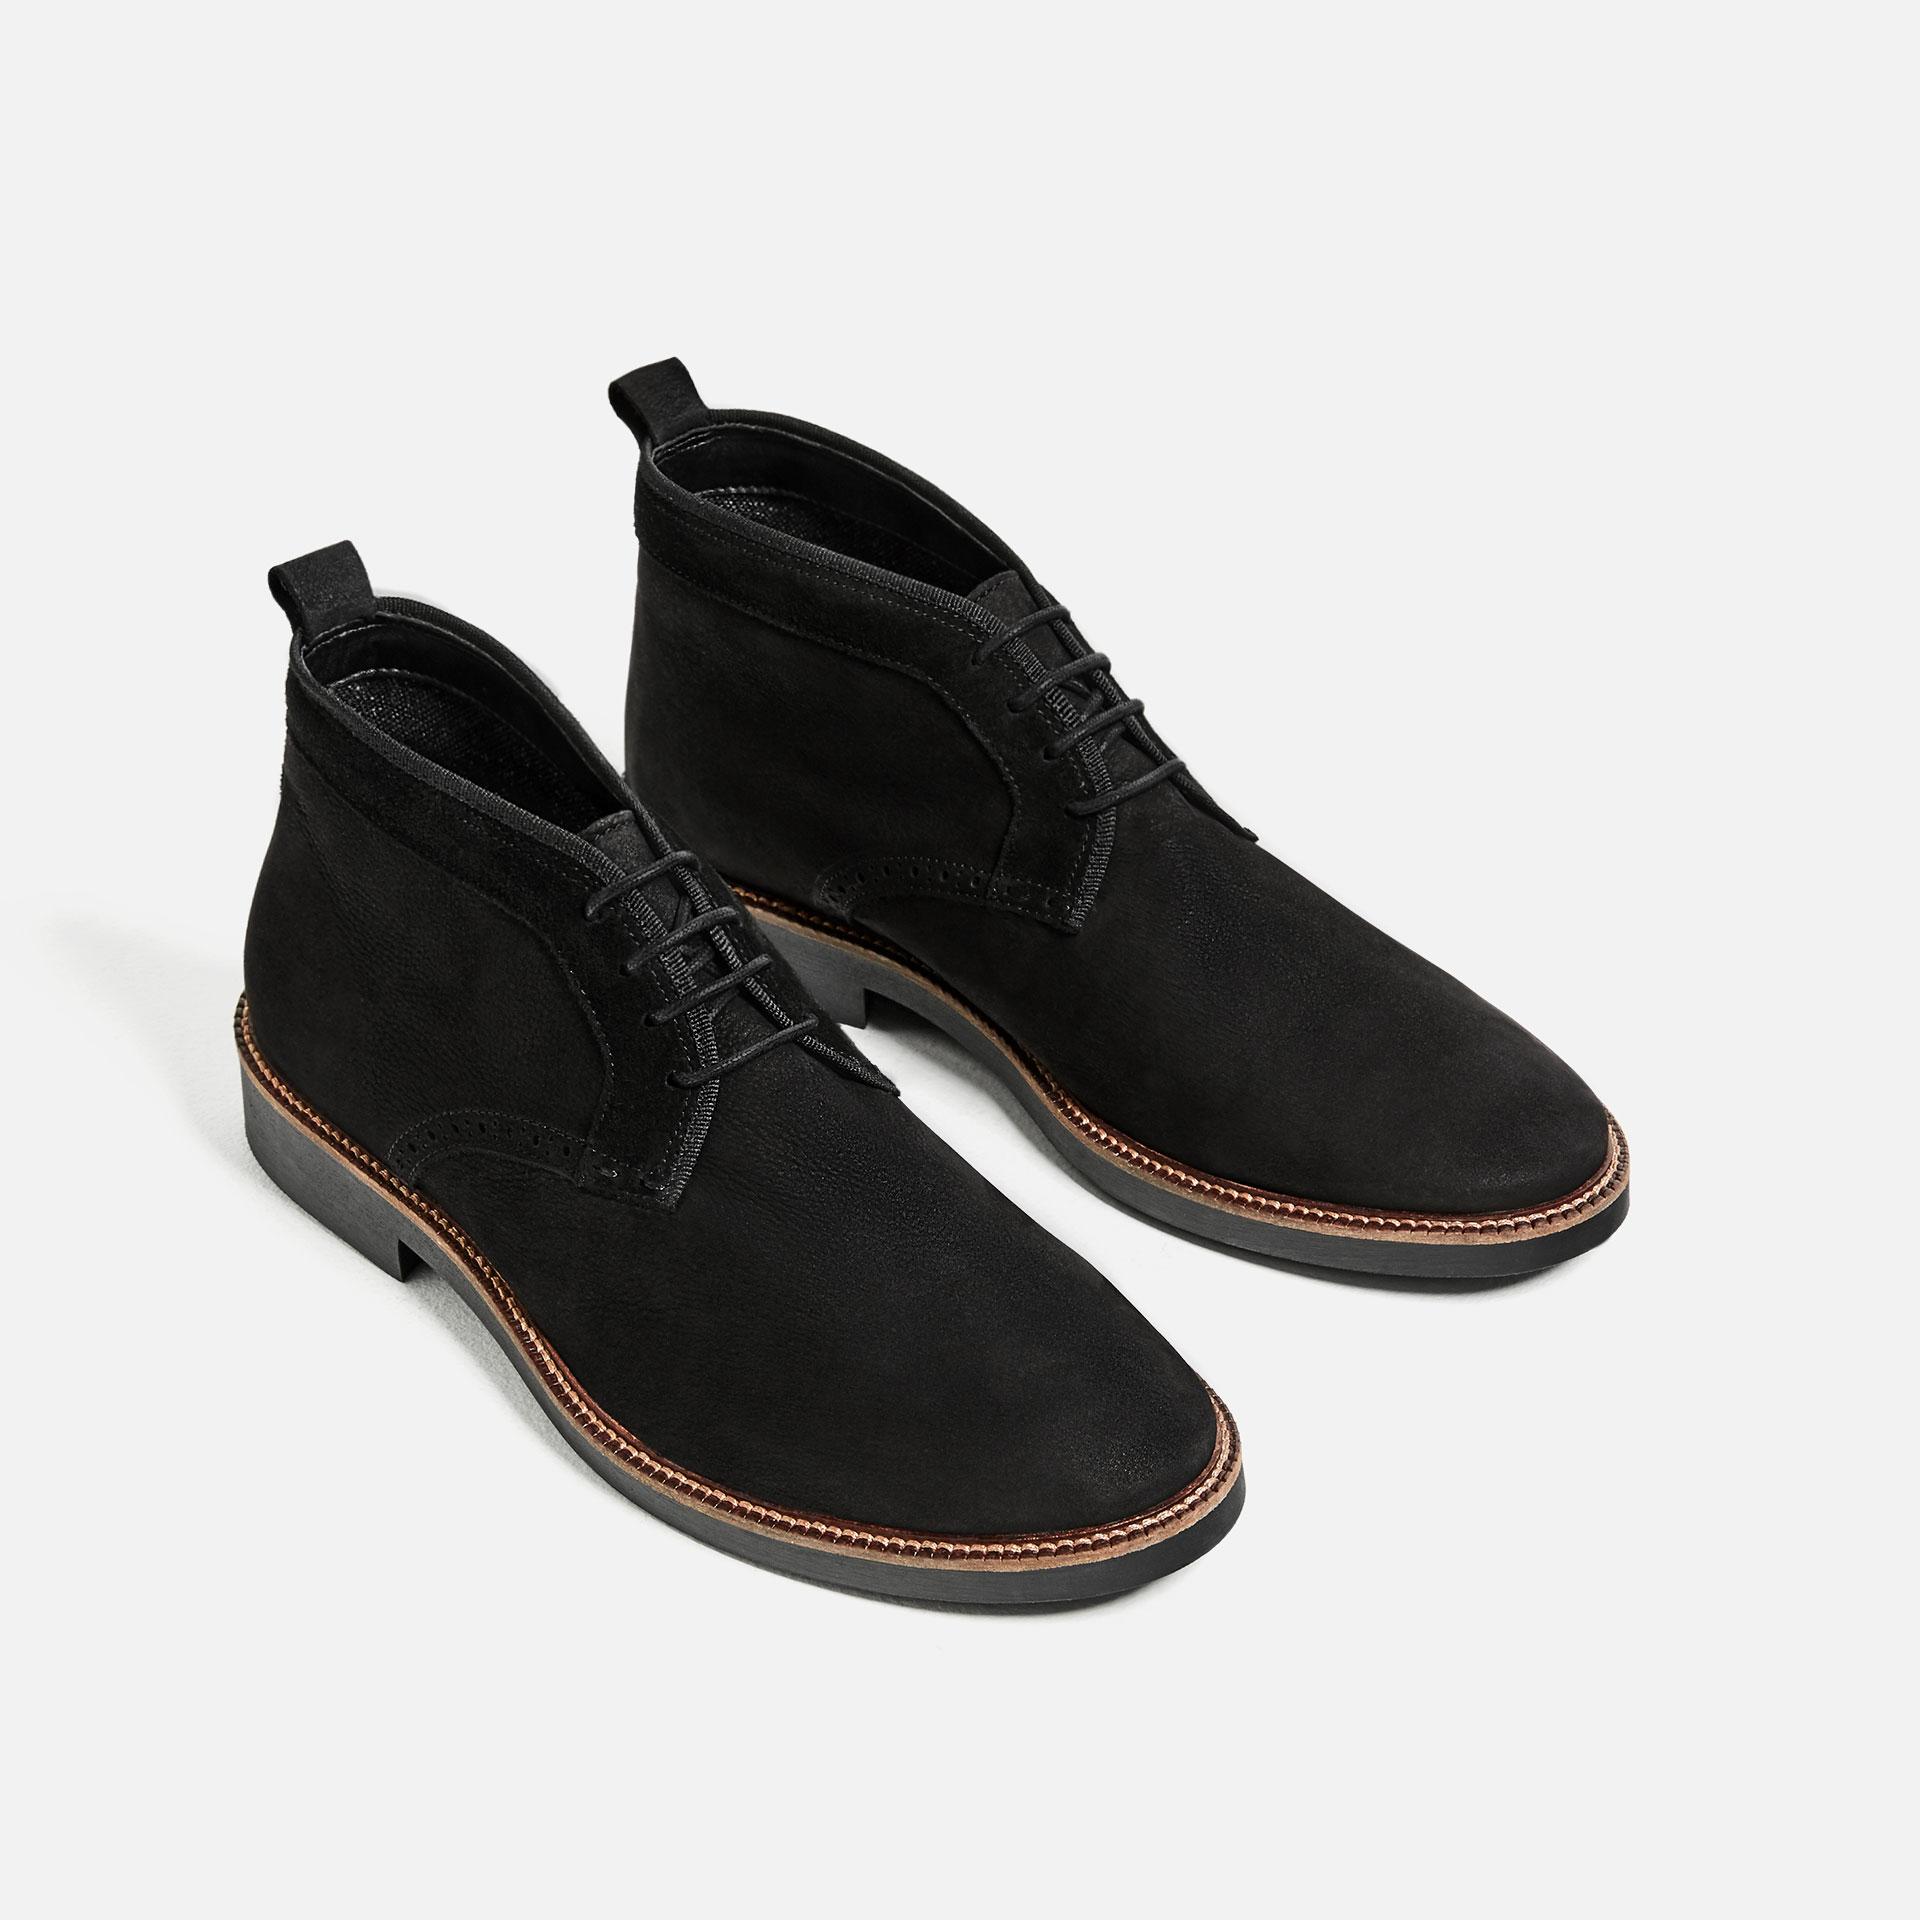 feeeb51b92d ΜΟΔΑ | Στιλάτα παπούτσια για να φορέσετε στη δουλειά